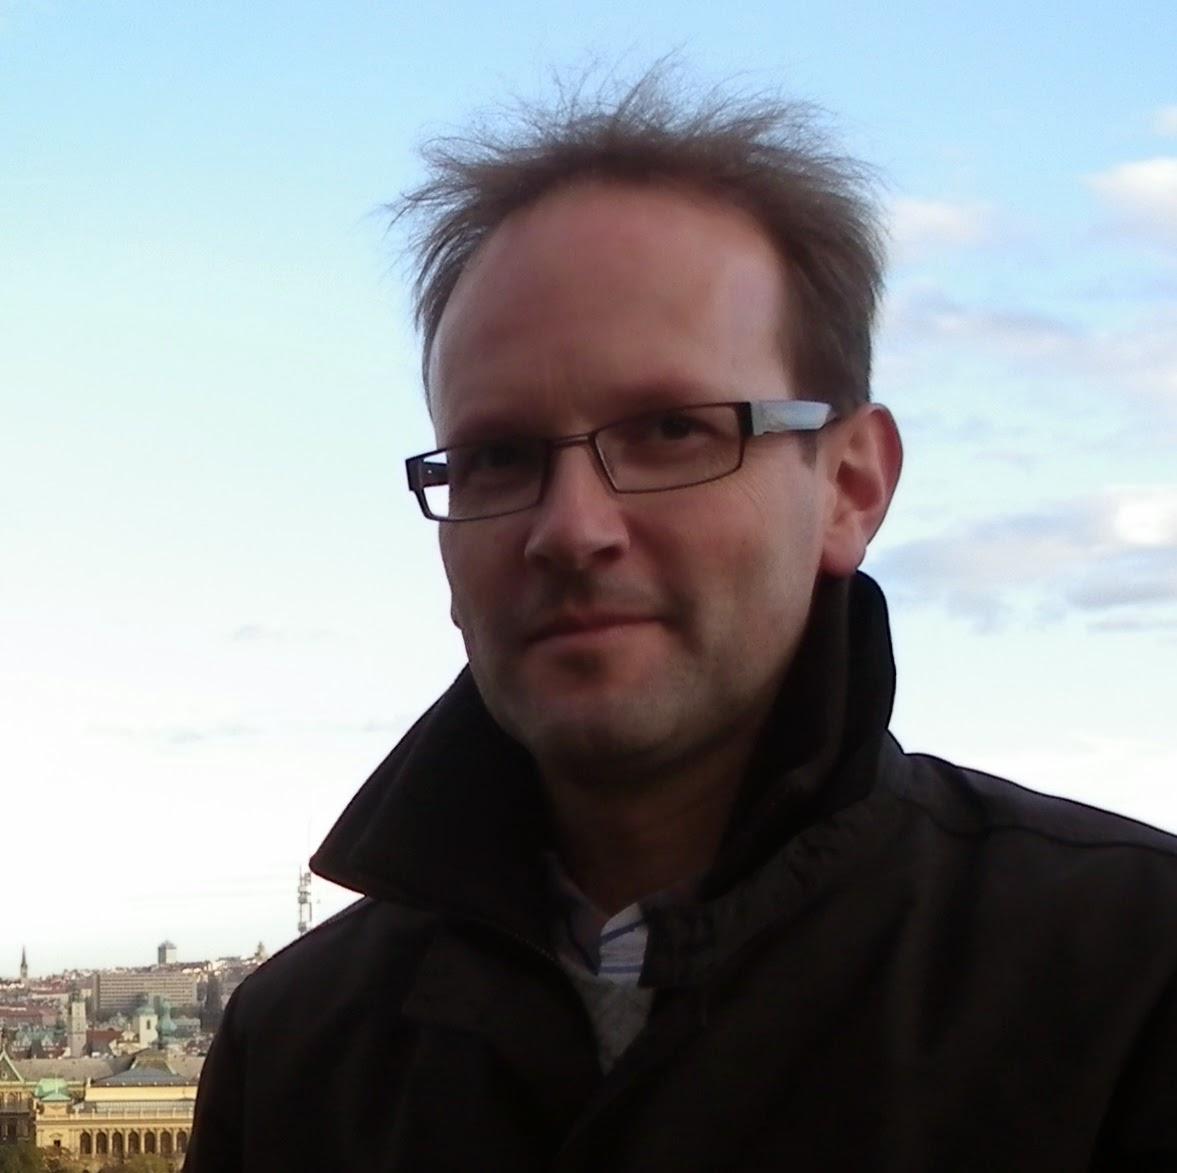 Wim Callewaert